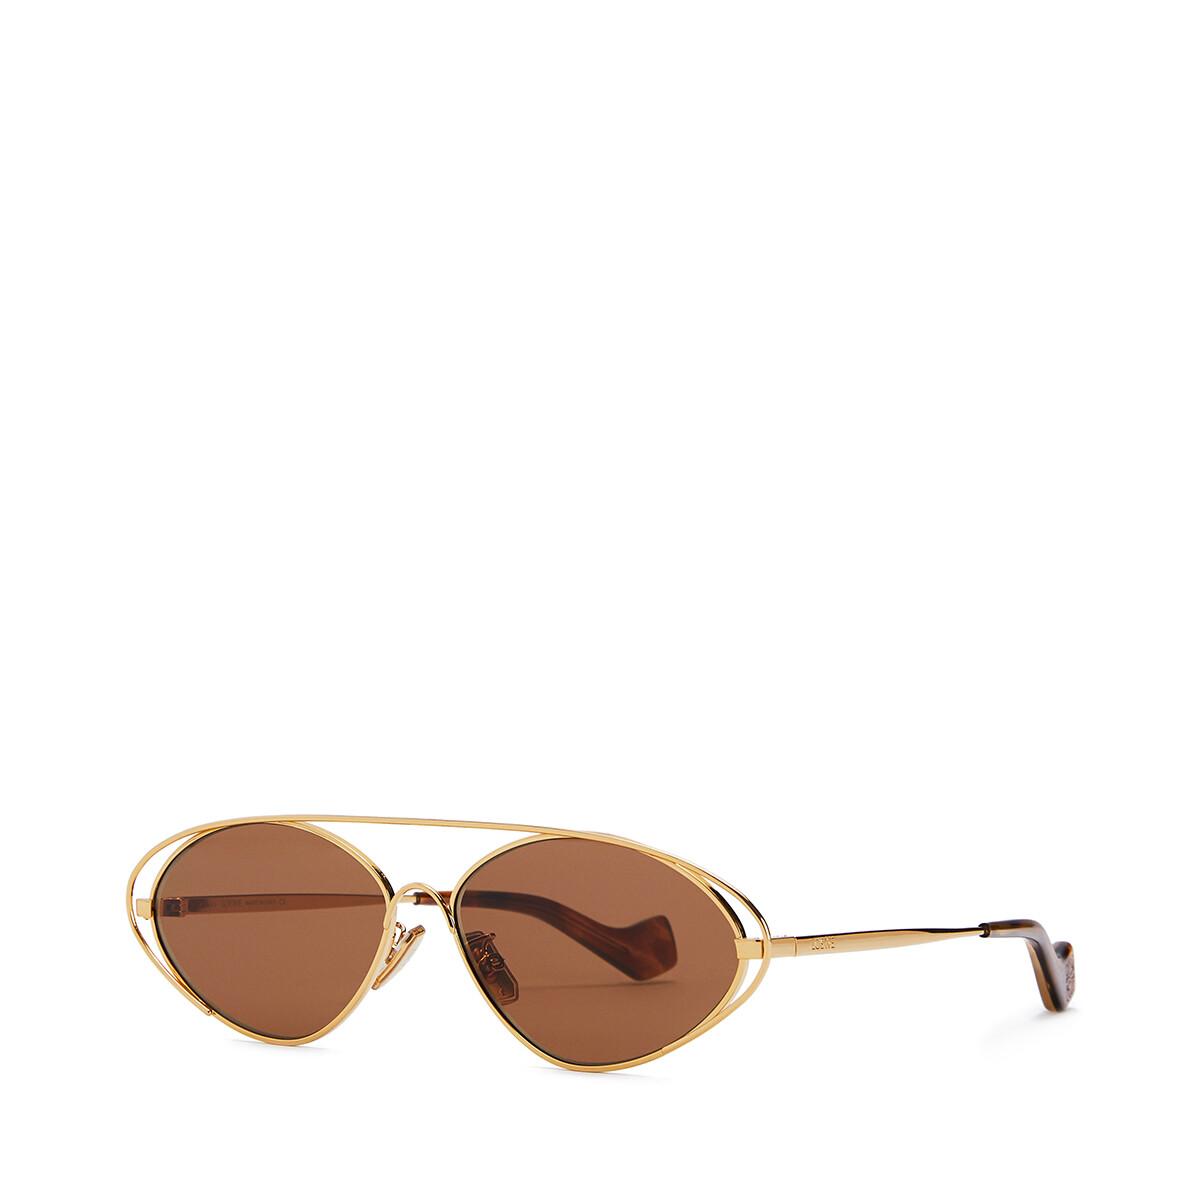 LOEWE Metal Oval Sunglasses Hazelnut front